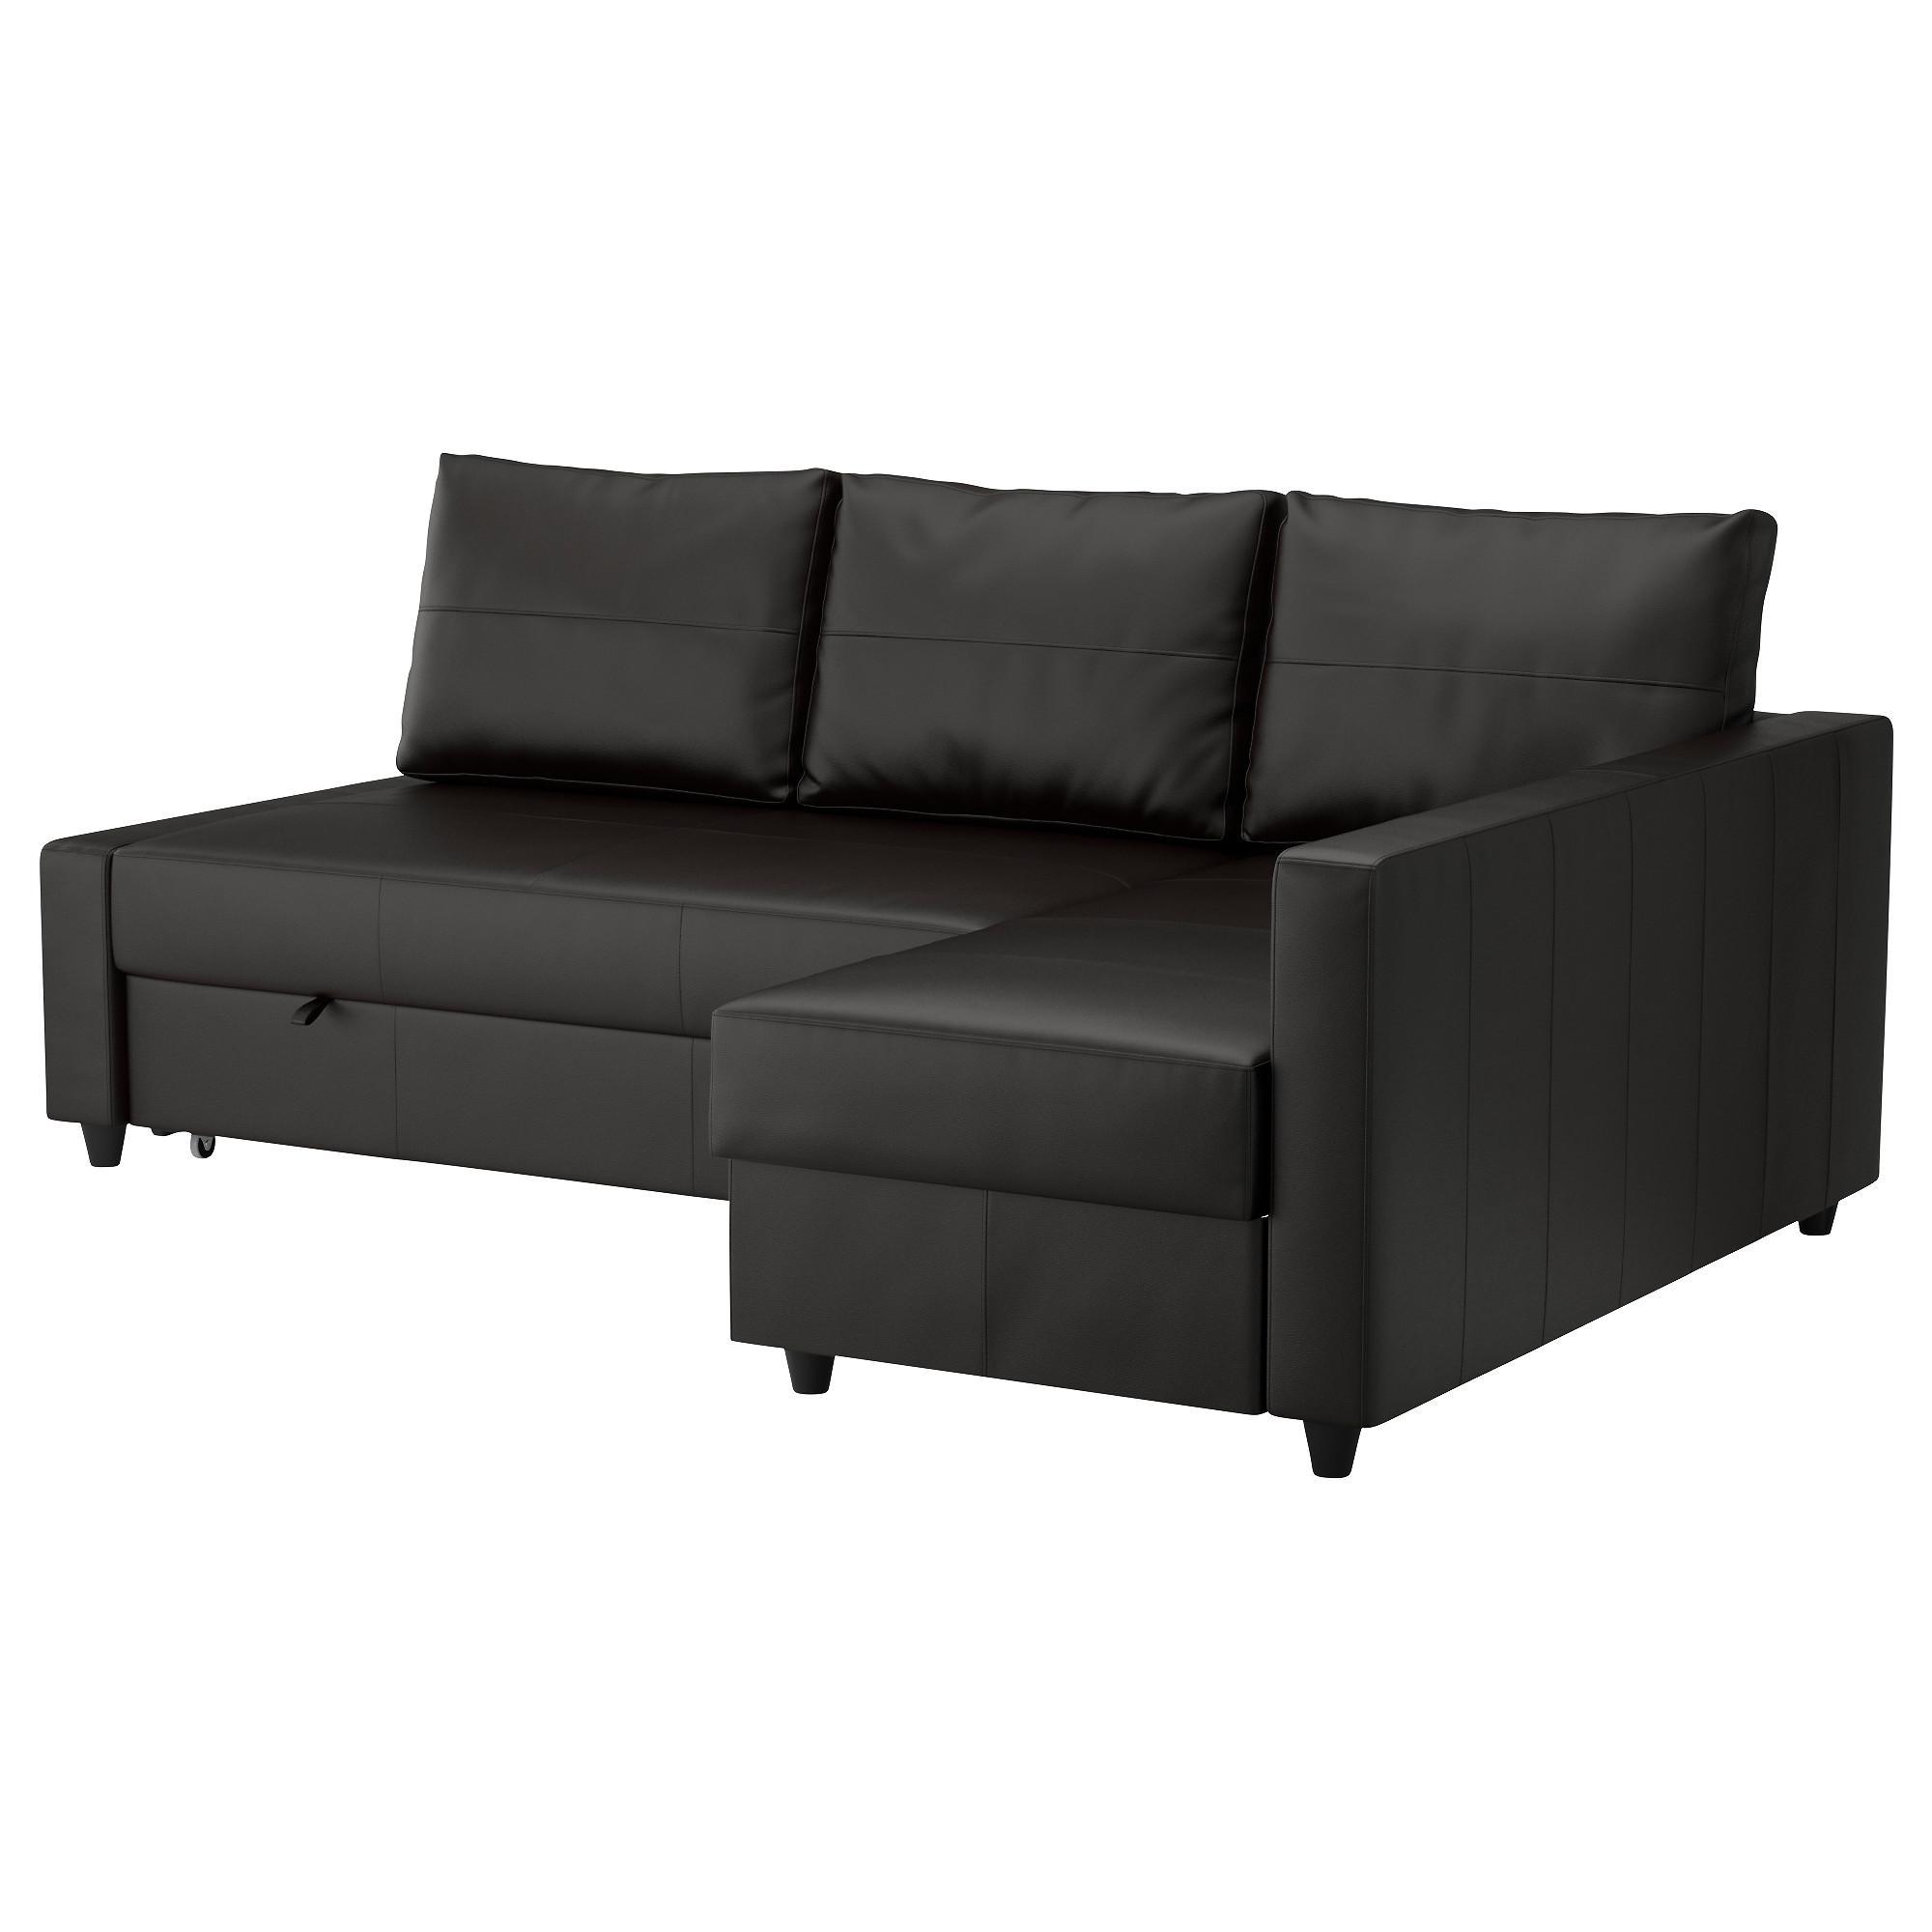 Friheten Corner Sofa Bed With Storage Bomstad Black – Ikea With Regard To Ikea Corner Sofa Bed With Storage (Image 4 of 20)